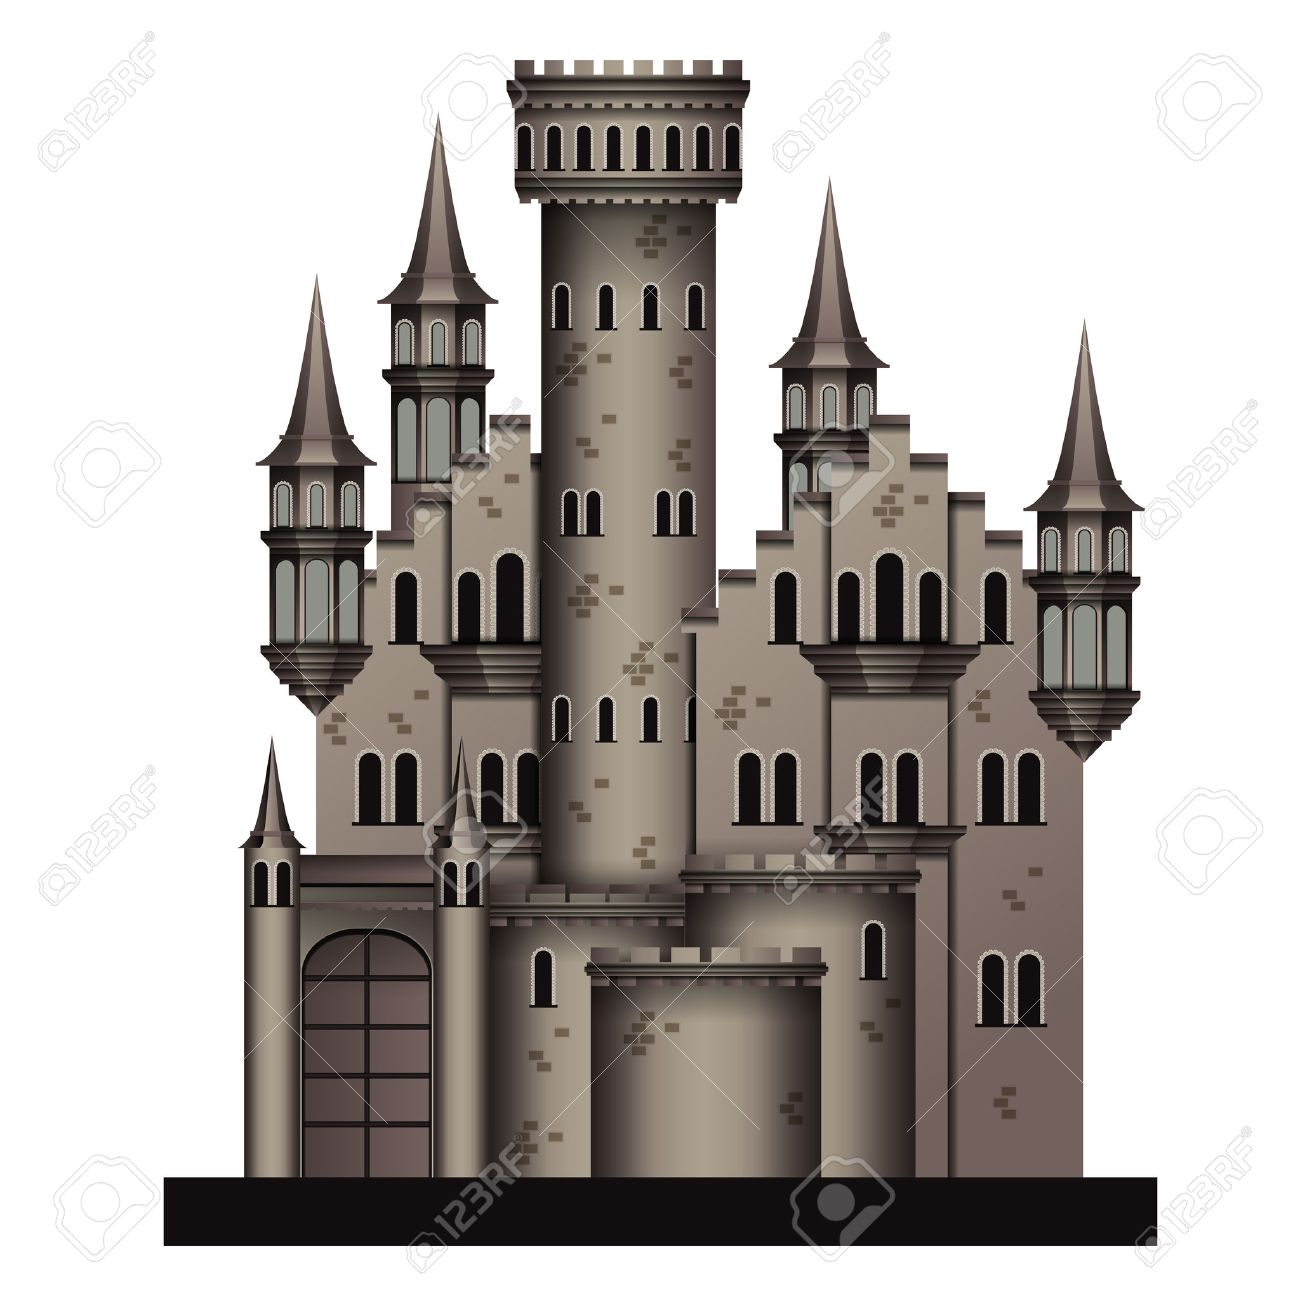 Medieval castle - 22961284